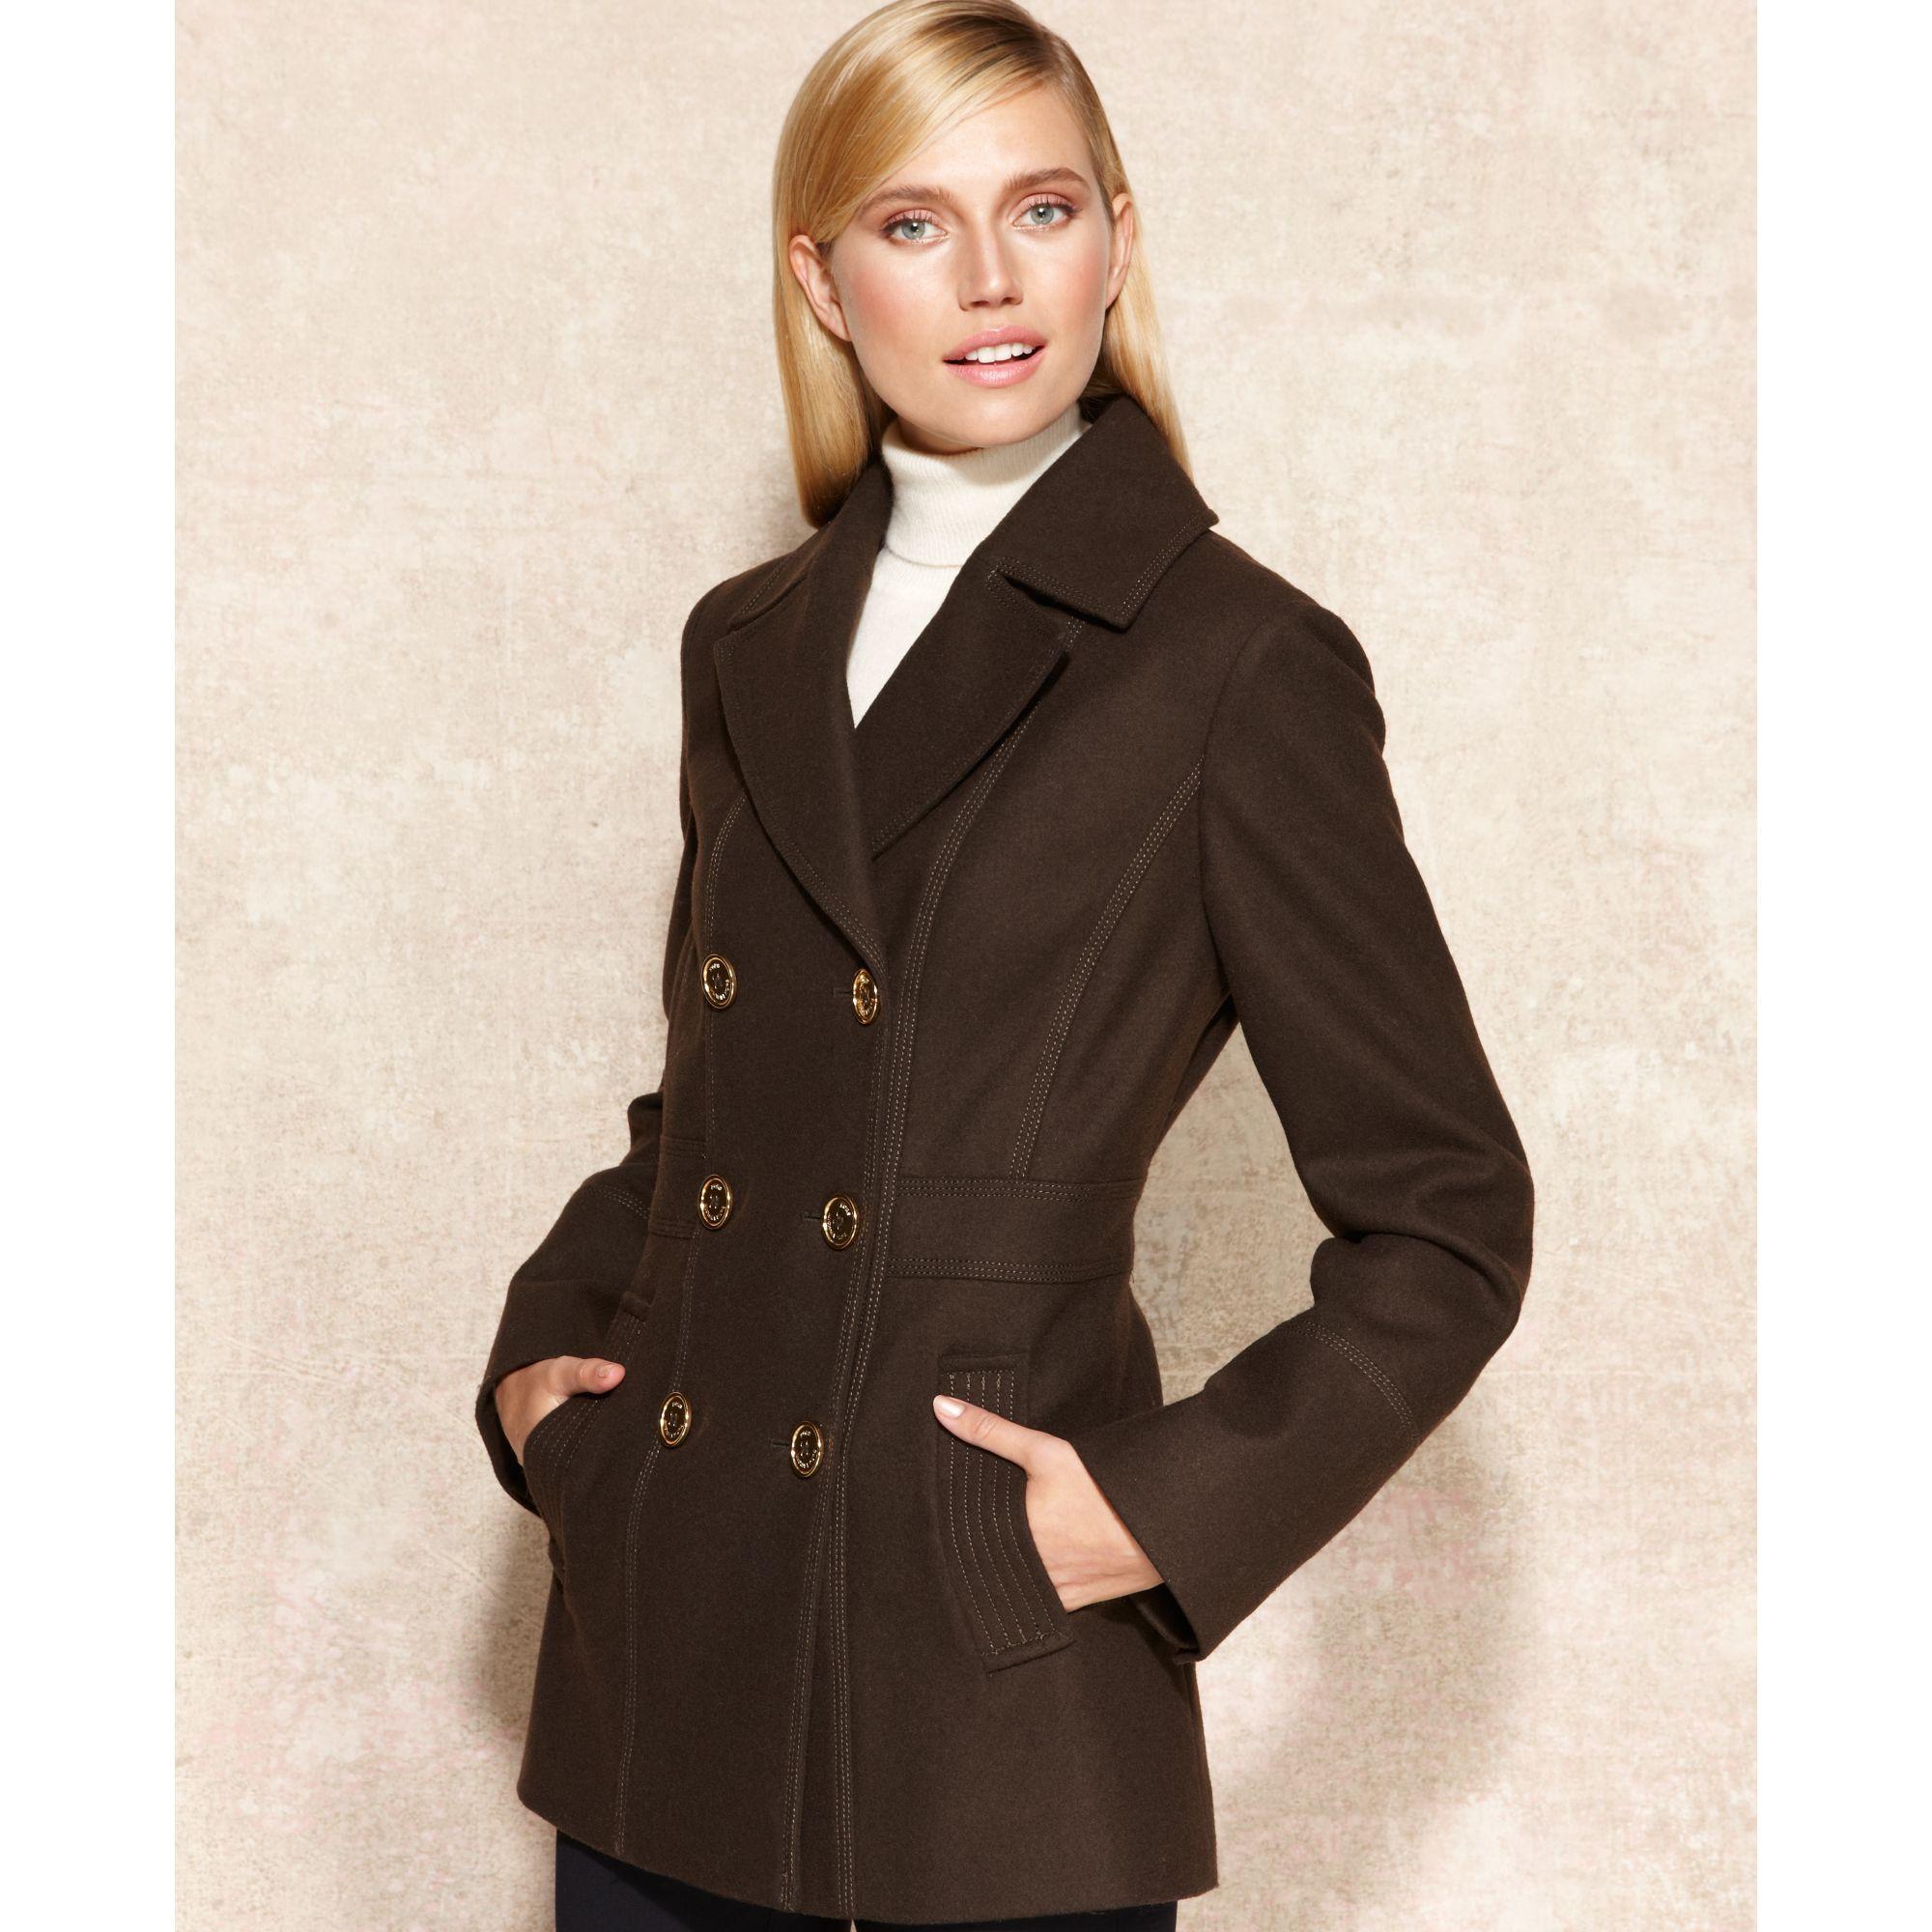 Elegant Beautyfashionandkiran How To Style With Overcoat This Winter.